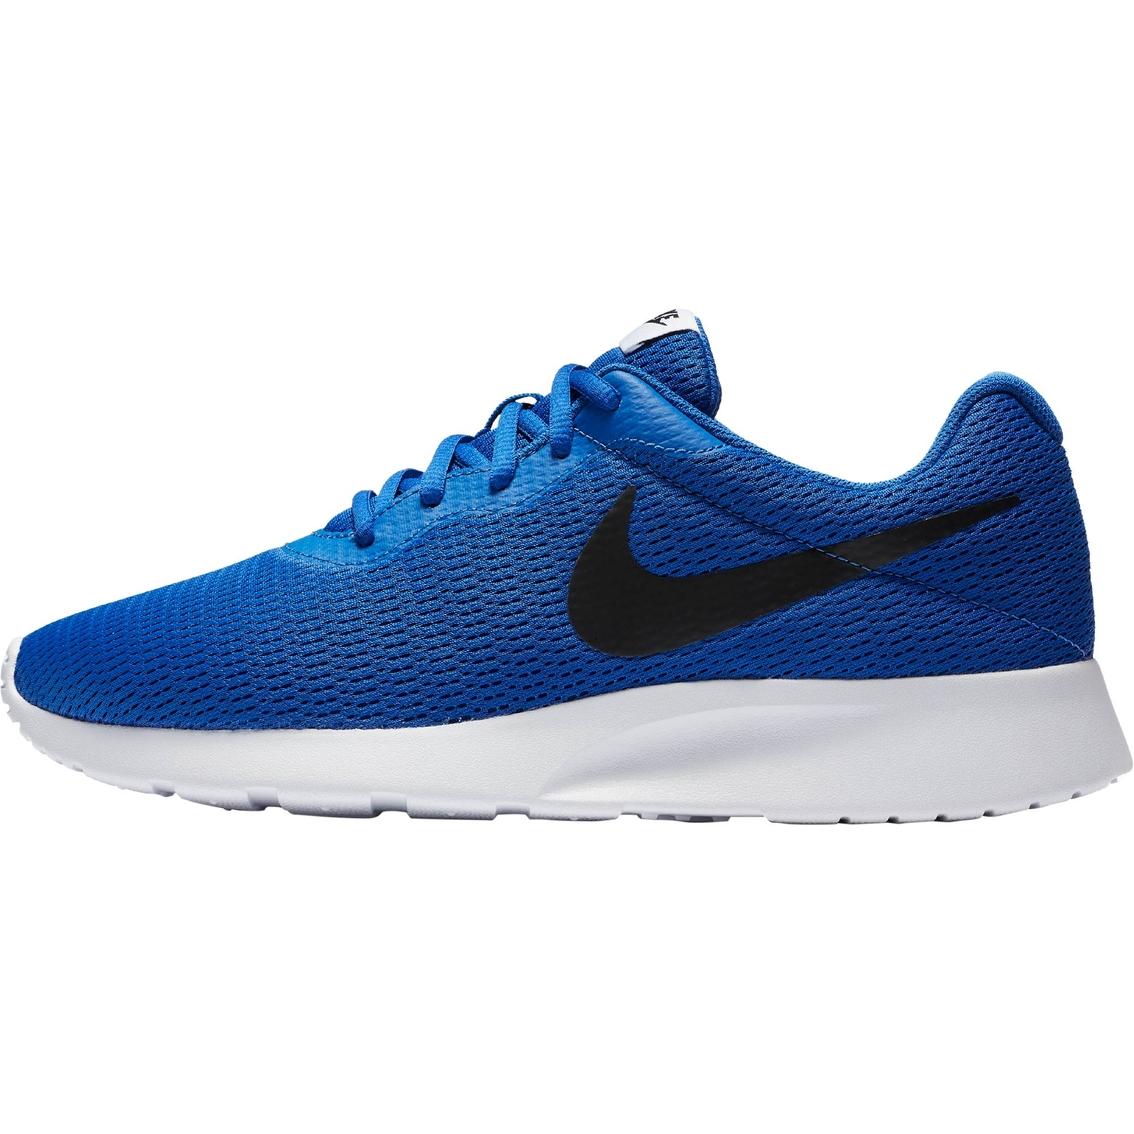 Nike Men's Tanjun Lifestyle Shoes